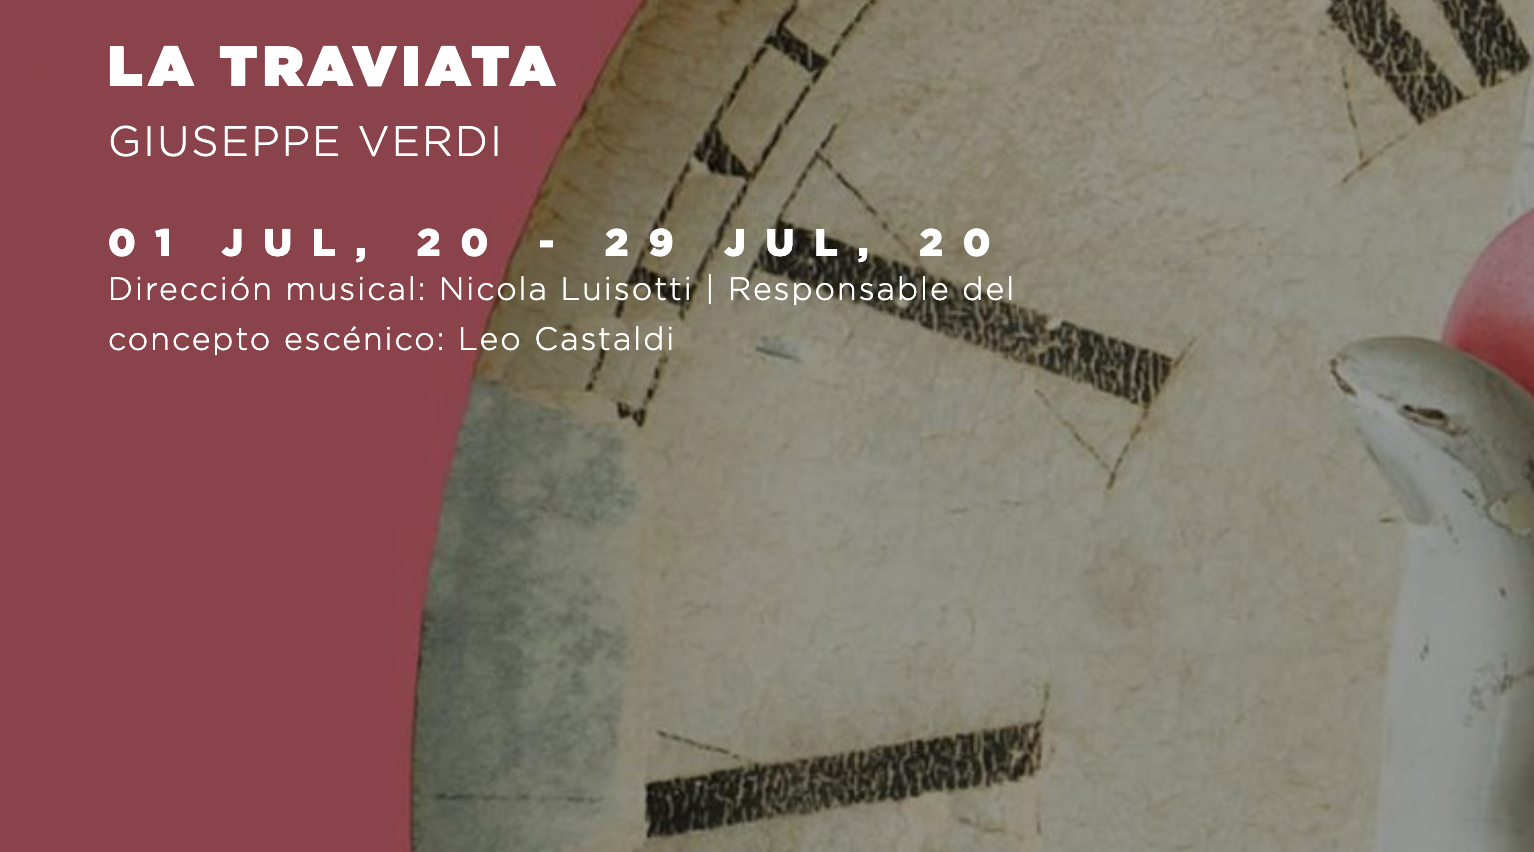 La ópera vuelve al Teatro Real con La Traviata